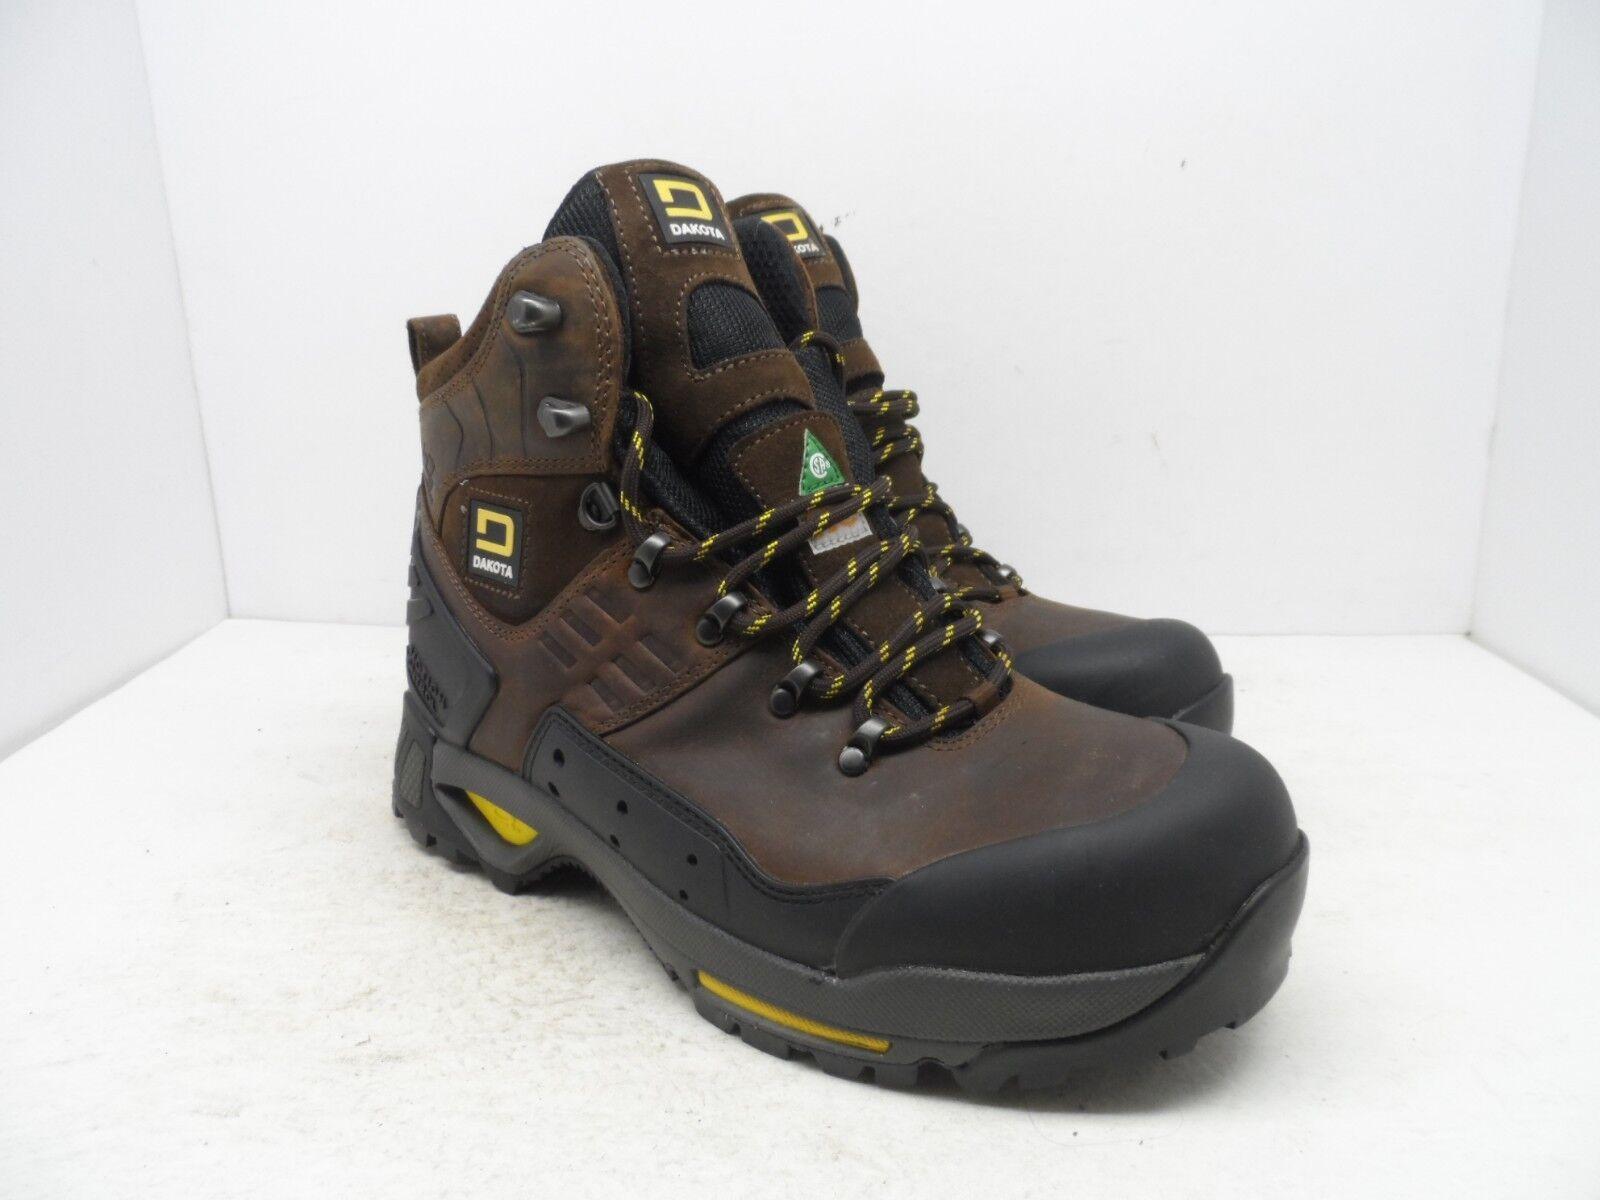 DAKOTA Men's HD3 Steel Toe Composite Plate Waterproof Hiking Boot Brown 10.5M